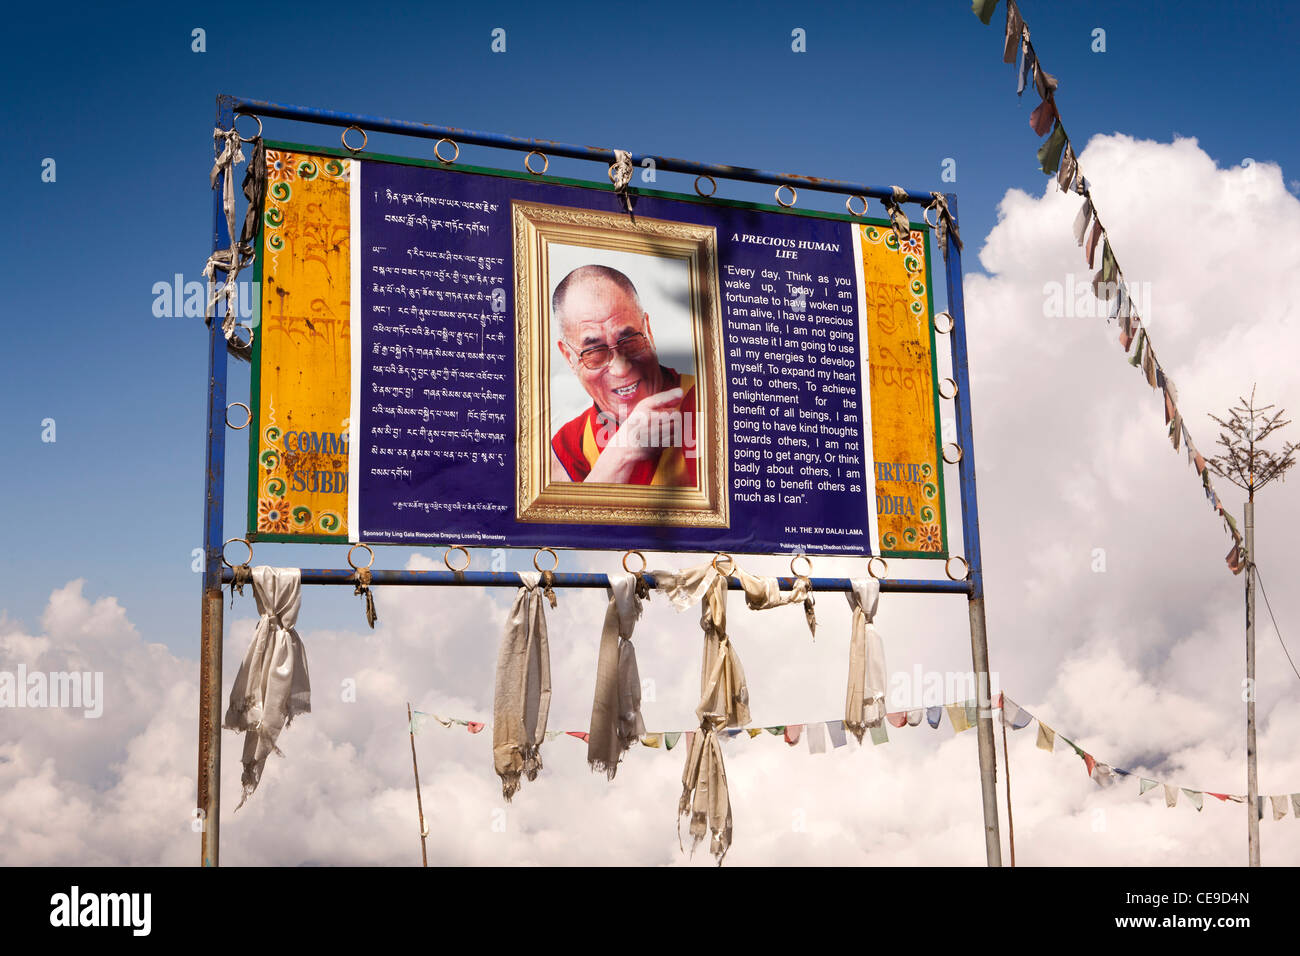 India, Arunachal Pradesh, Tawang, Jang, Dalai Lama sign on route of his exile from Tibet - Stock Image